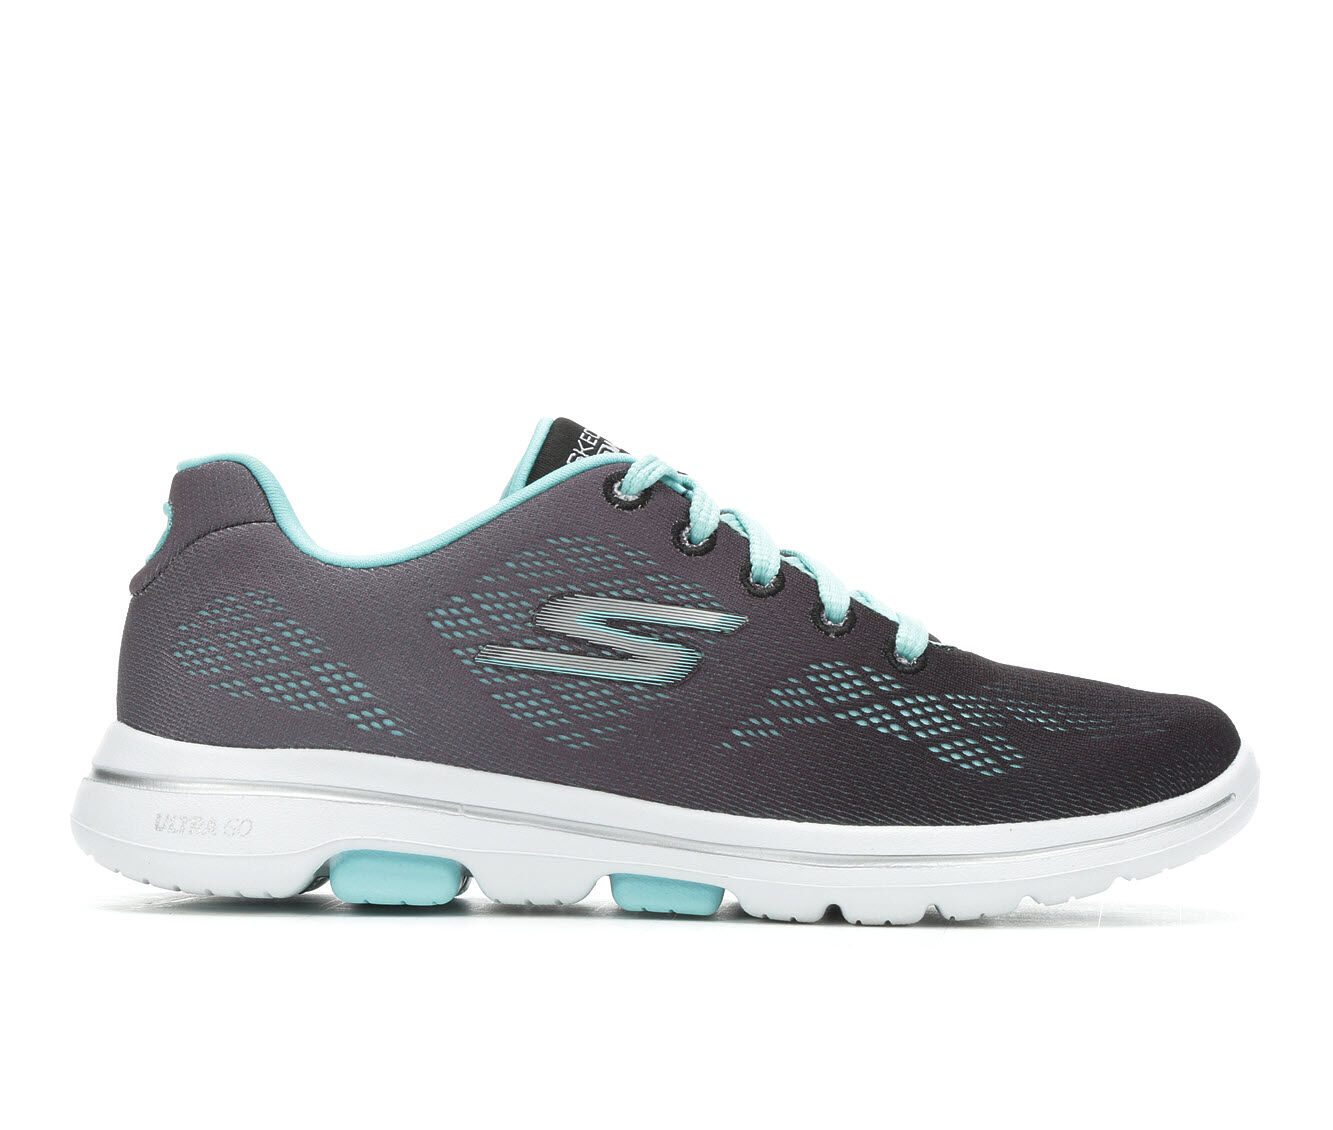 Women's Skechers Go Go Walk 5 Alive 15929 Walking Shoes